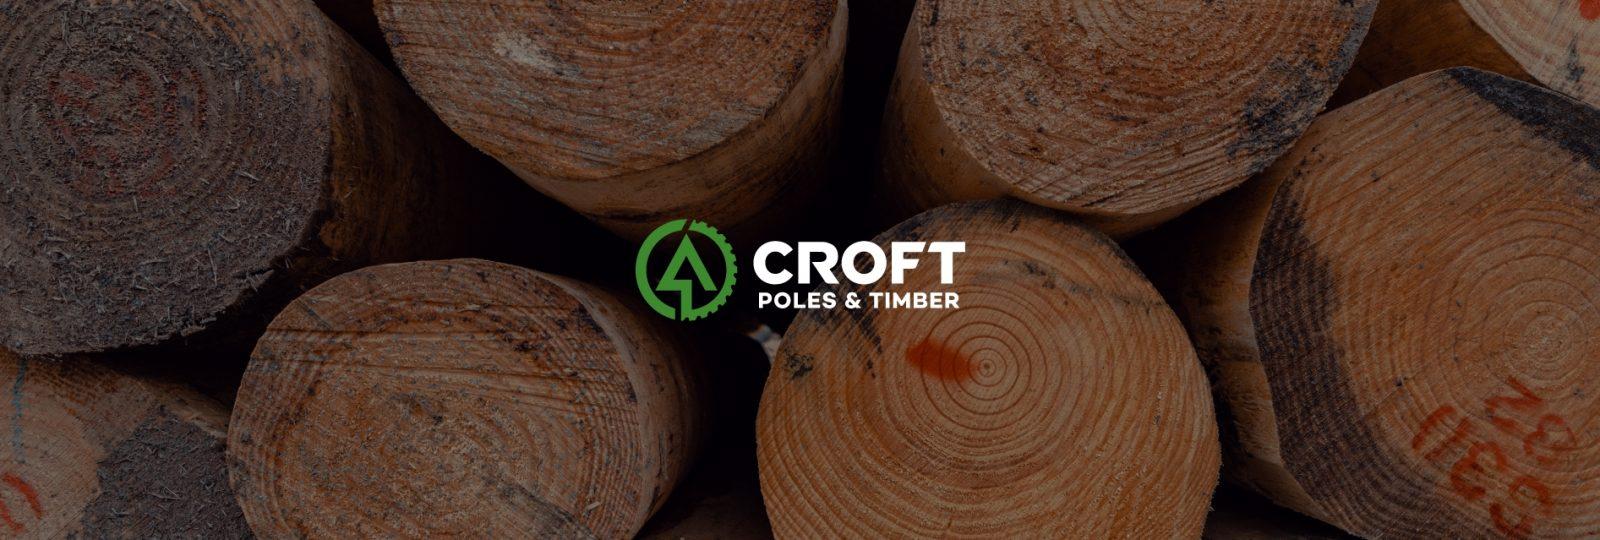 Croft Poles & Timber - Banner Image